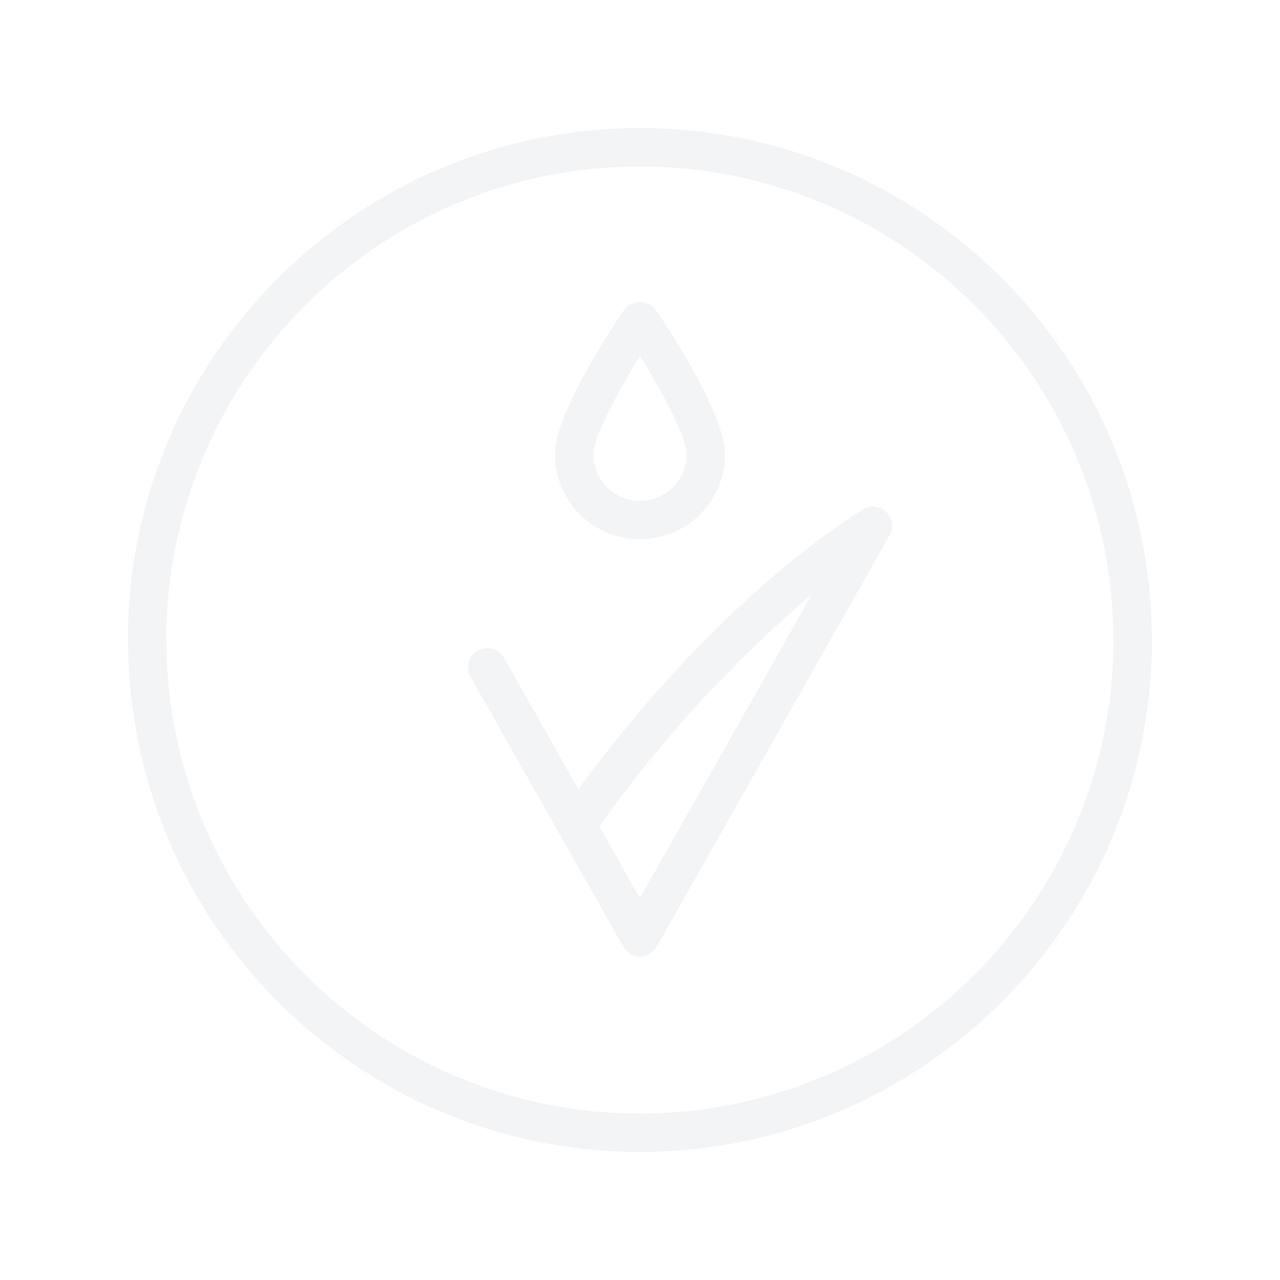 Elizabeth Arden 5th Avenue 125ml Eau De Parfum komplekt